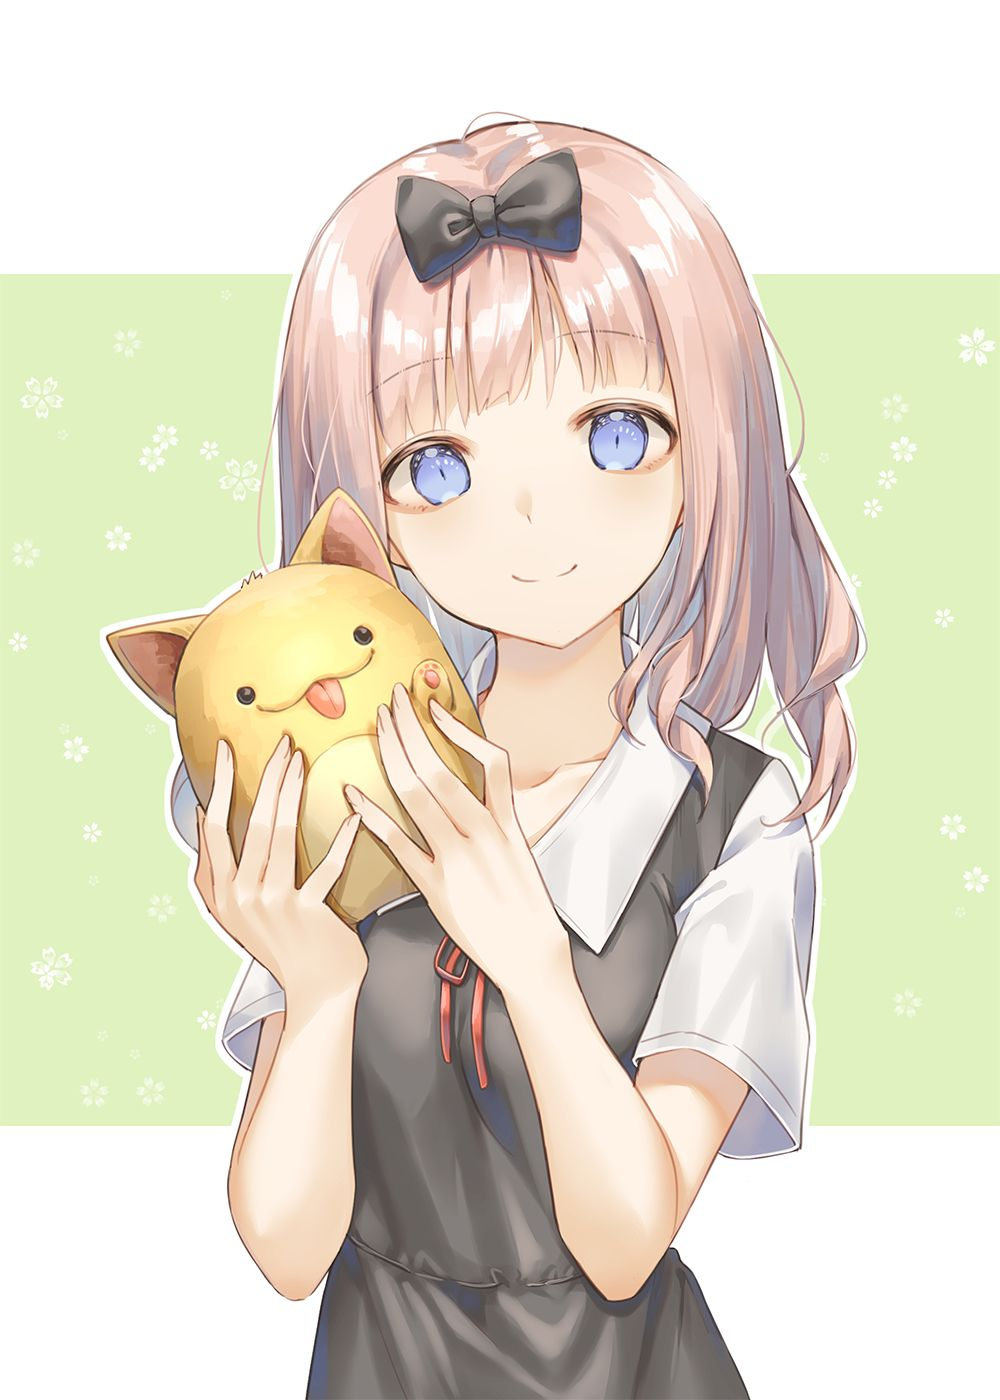 Chika [Kaguyasama] in 2020 Anime, Anime episodes, Anime